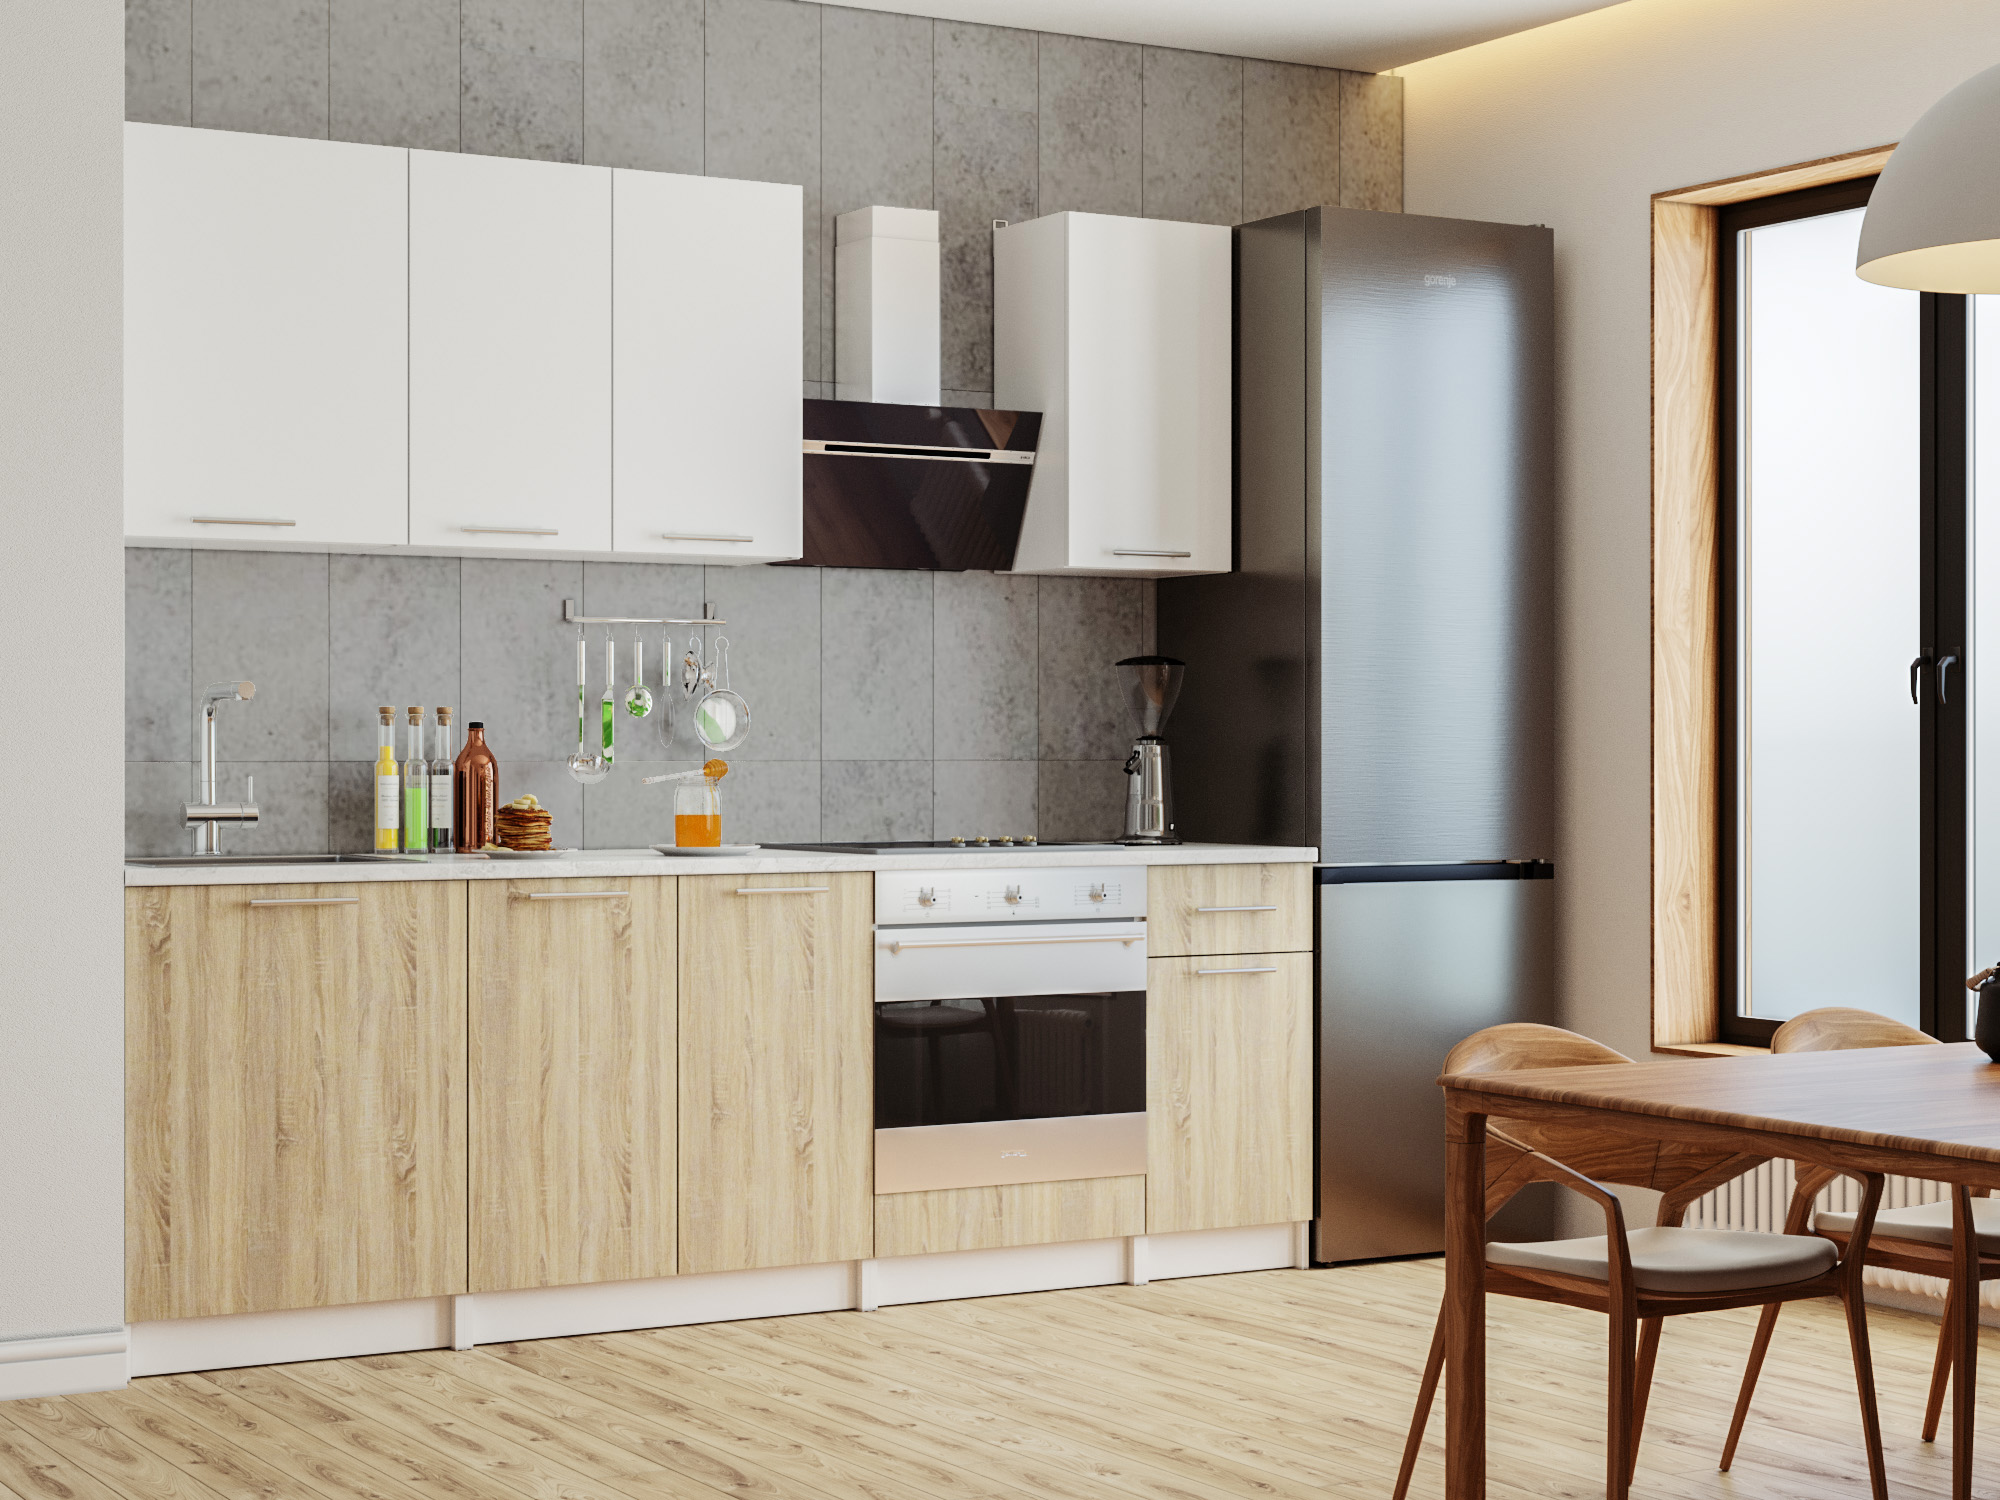 Кухня Моника 2,4 м Белый, Дуб сонома, , ЛДСП Белый, Дуб сонома